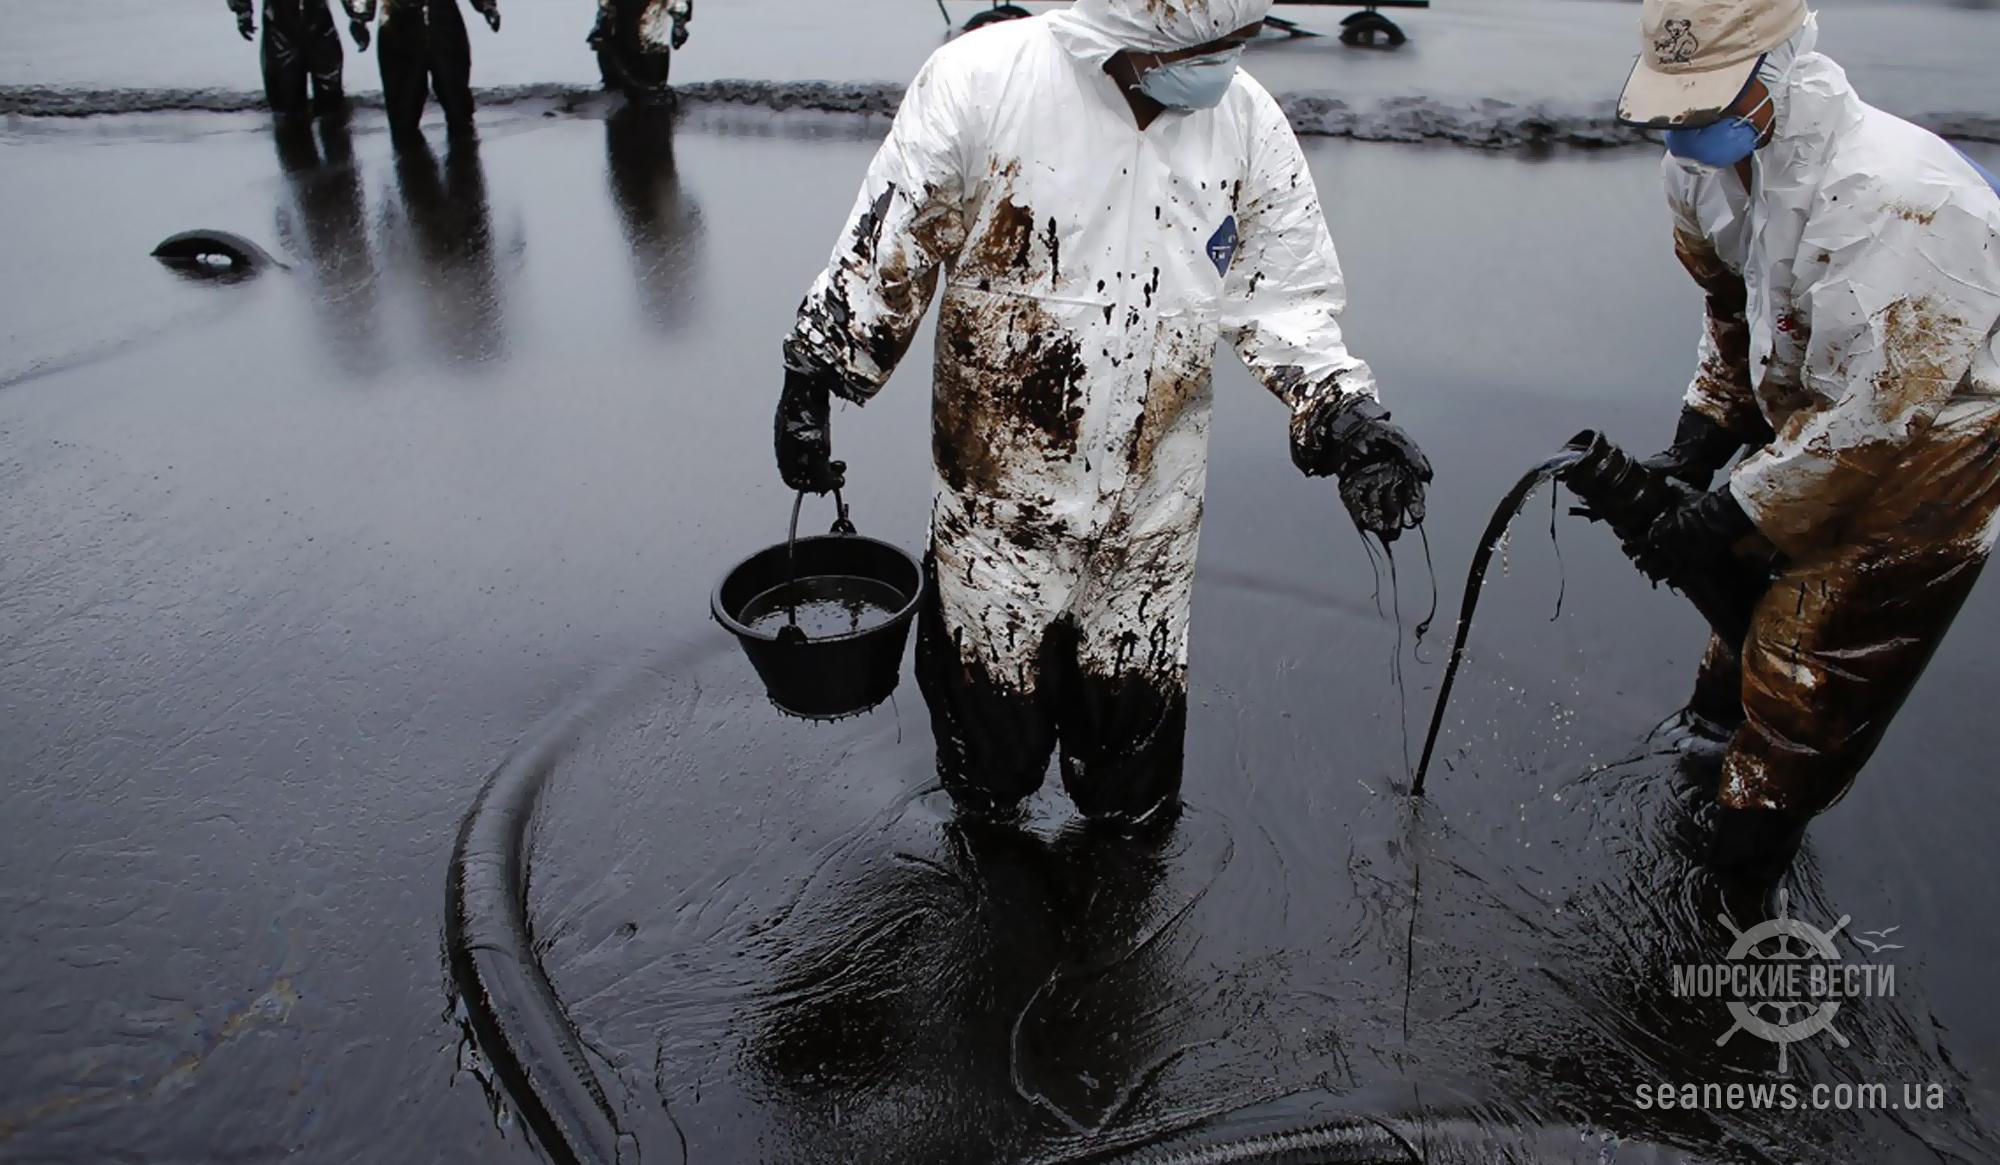 На нефтяном терминале в Литве произошла утечка 2 тонн нефти